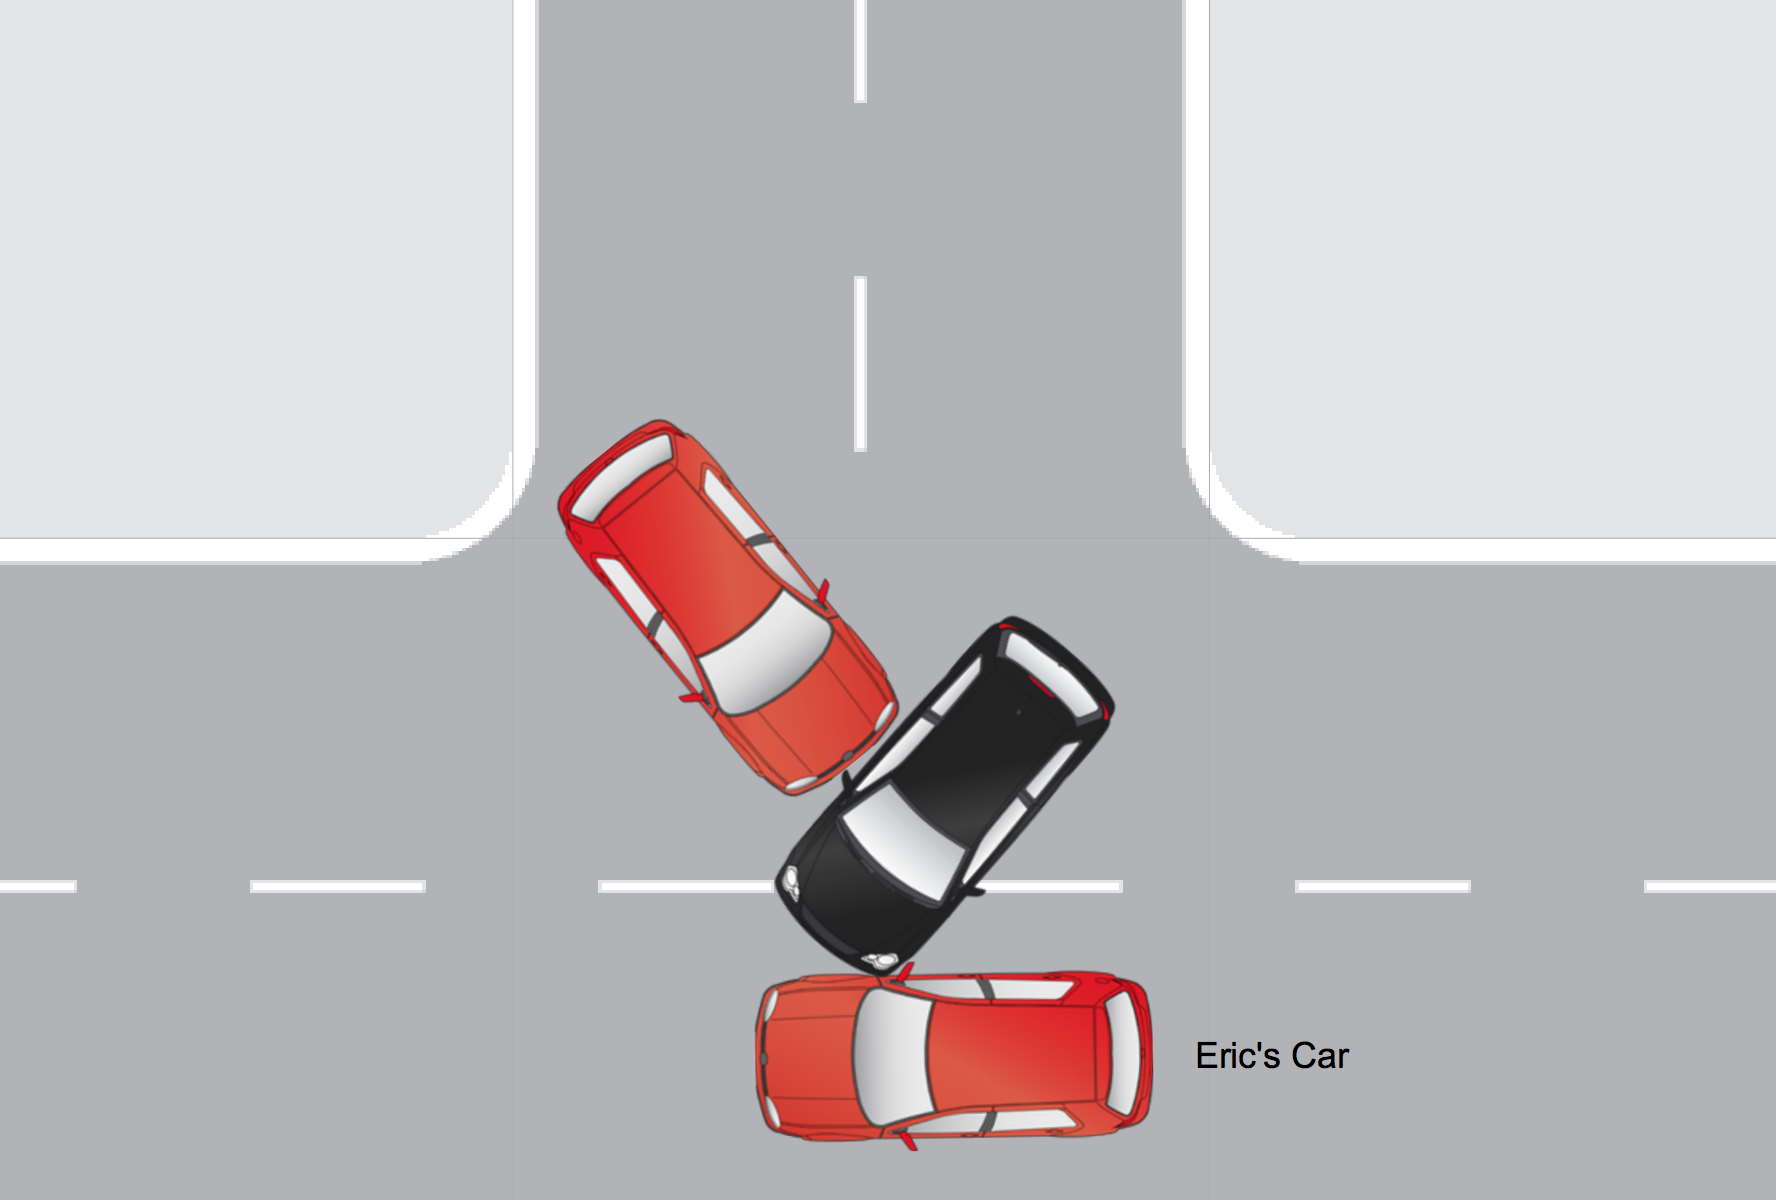 Eric's Accident